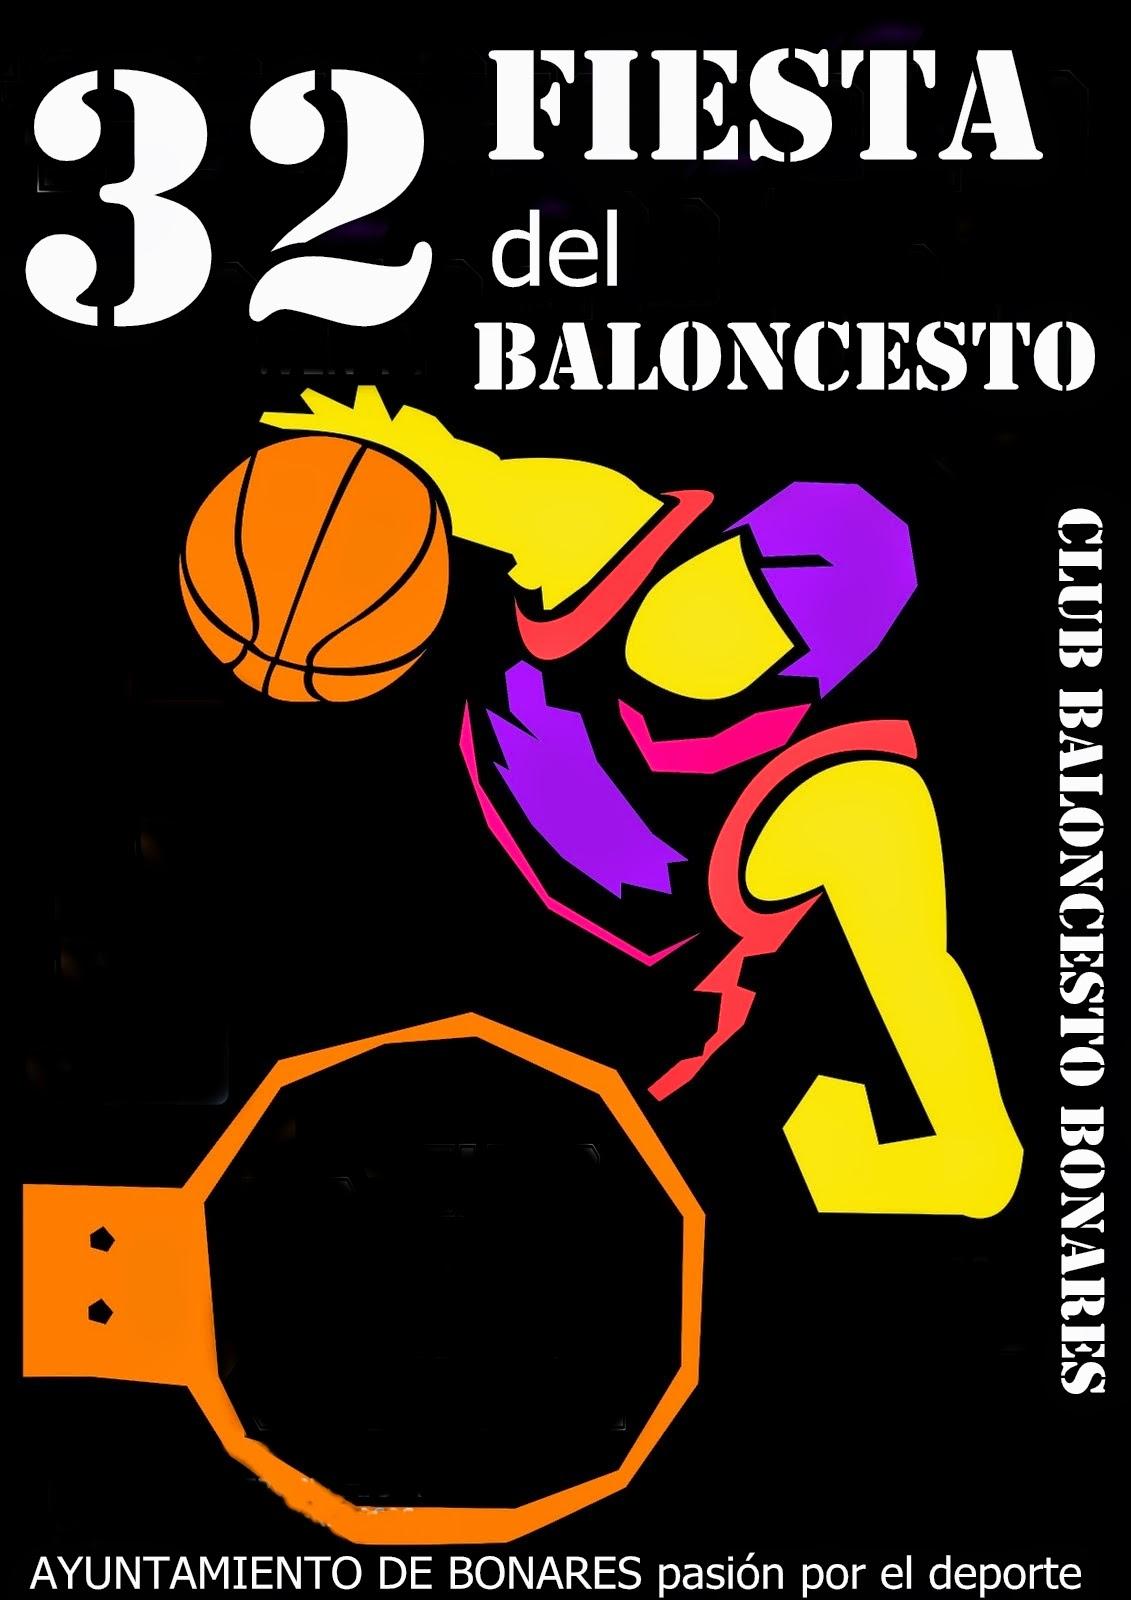 32 FIESTA DEL BALONCESTO